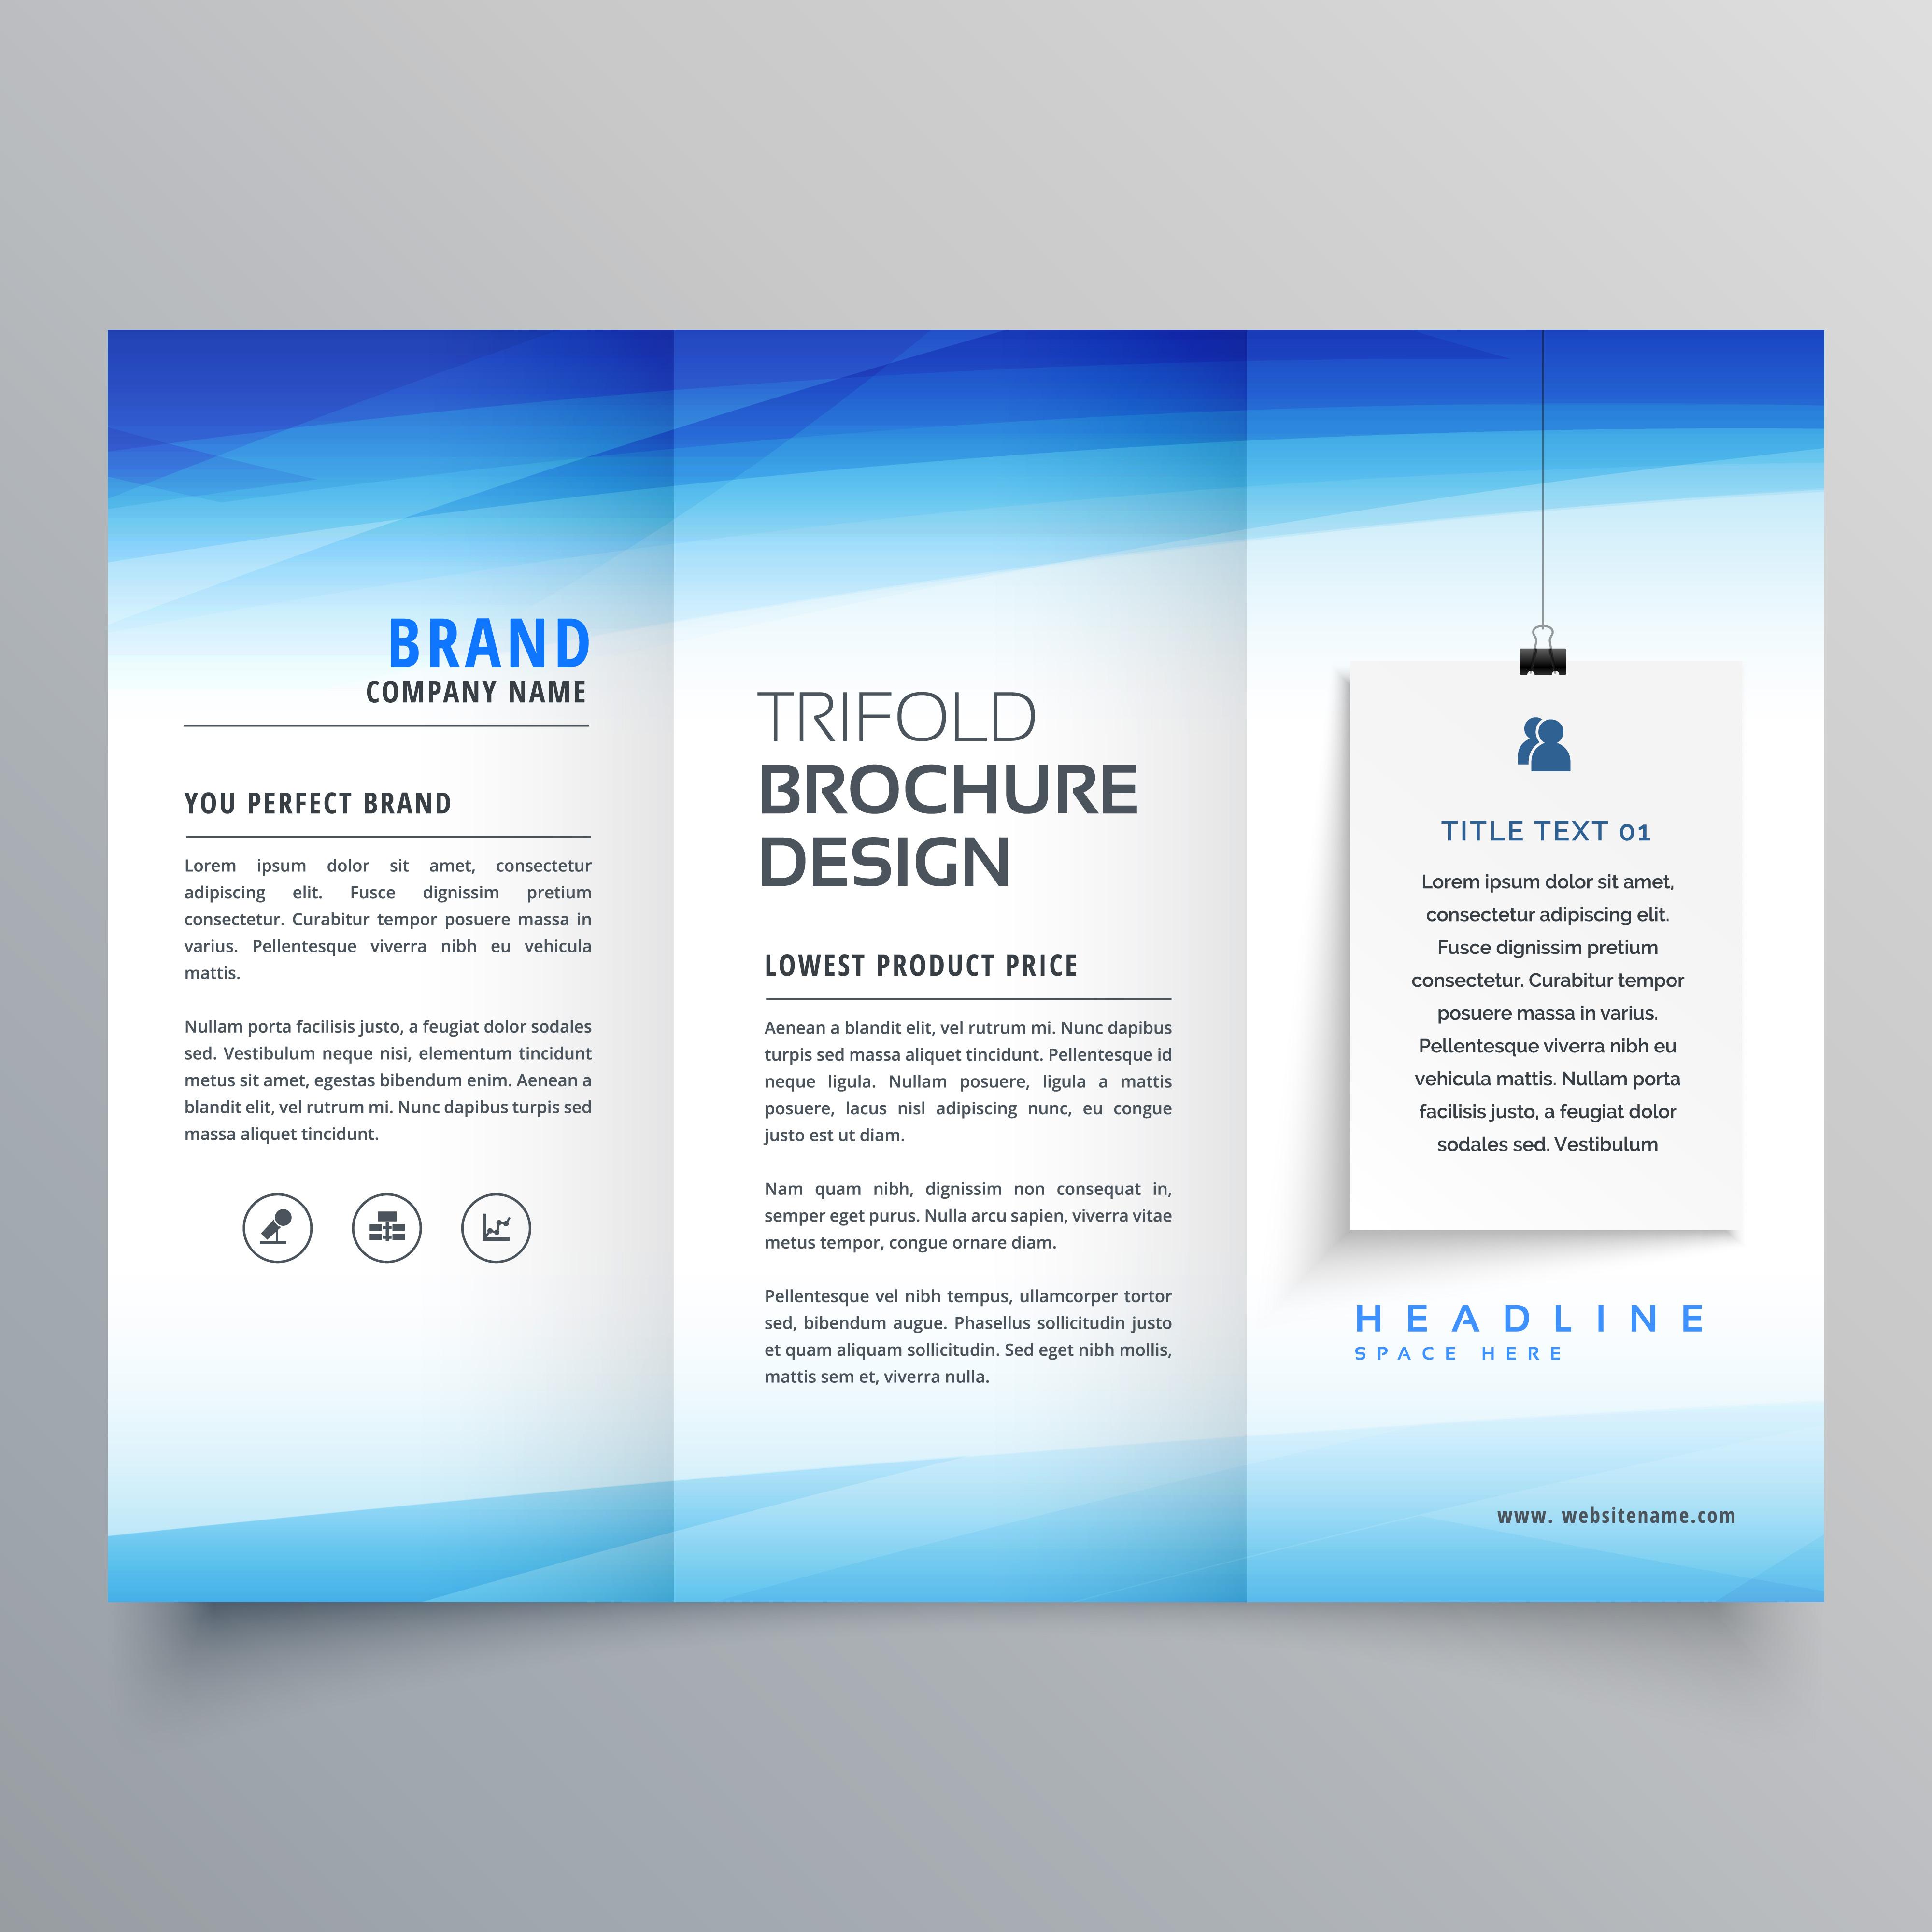 Elegant trifold brochure design template download free for Classy brochure design